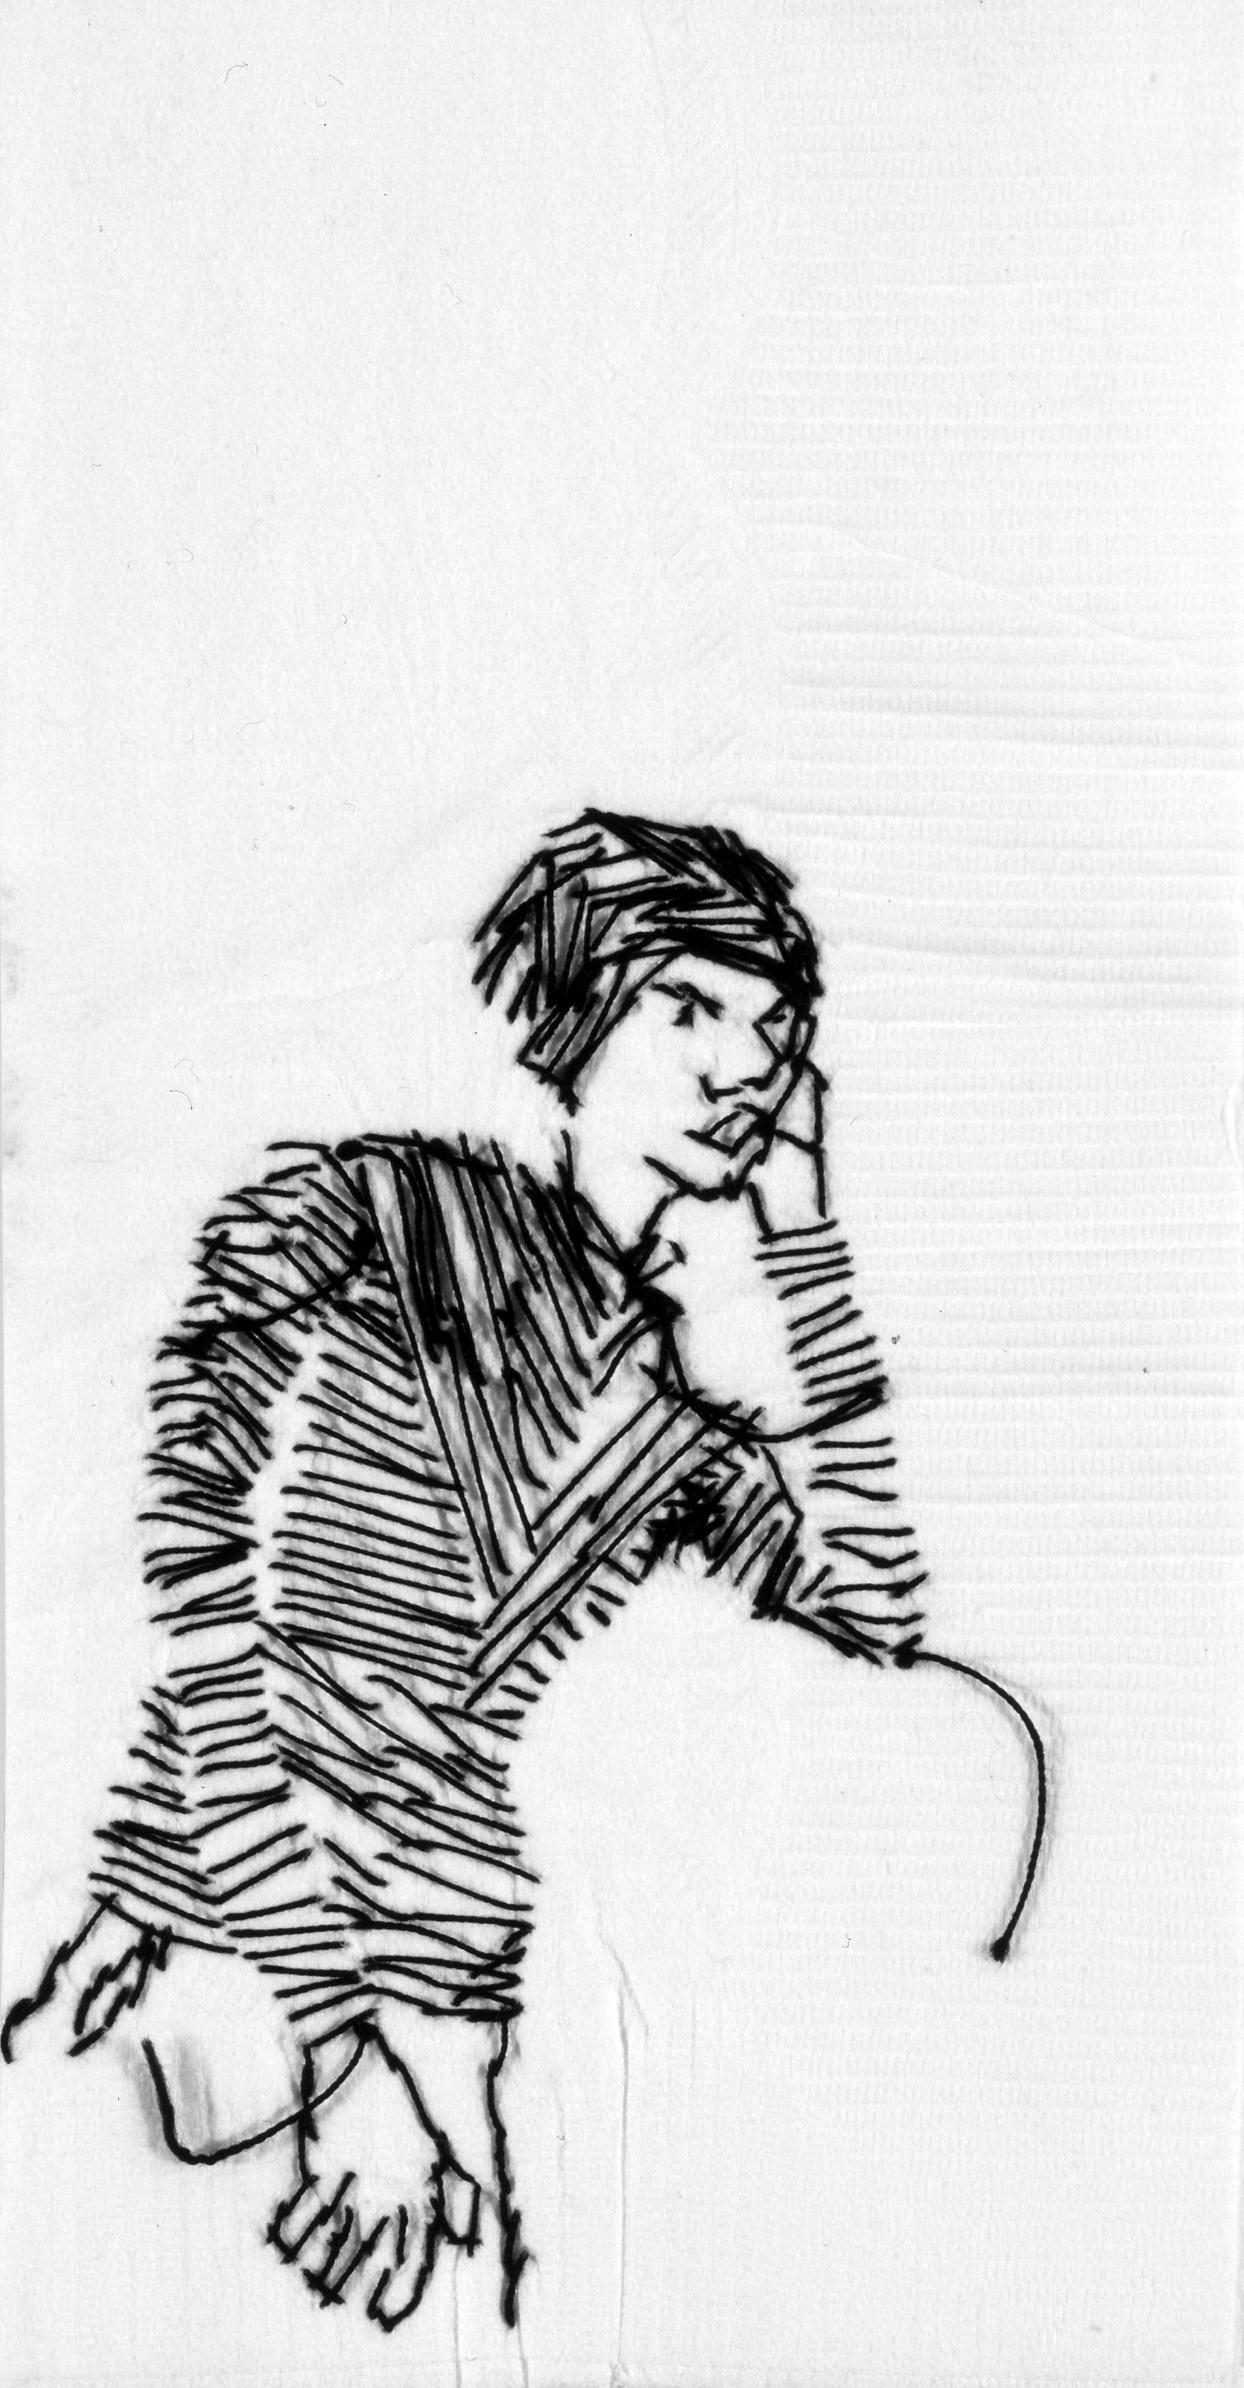 "Ryan I  Black thread on paper napkin, 7"" x 4"", 2004"